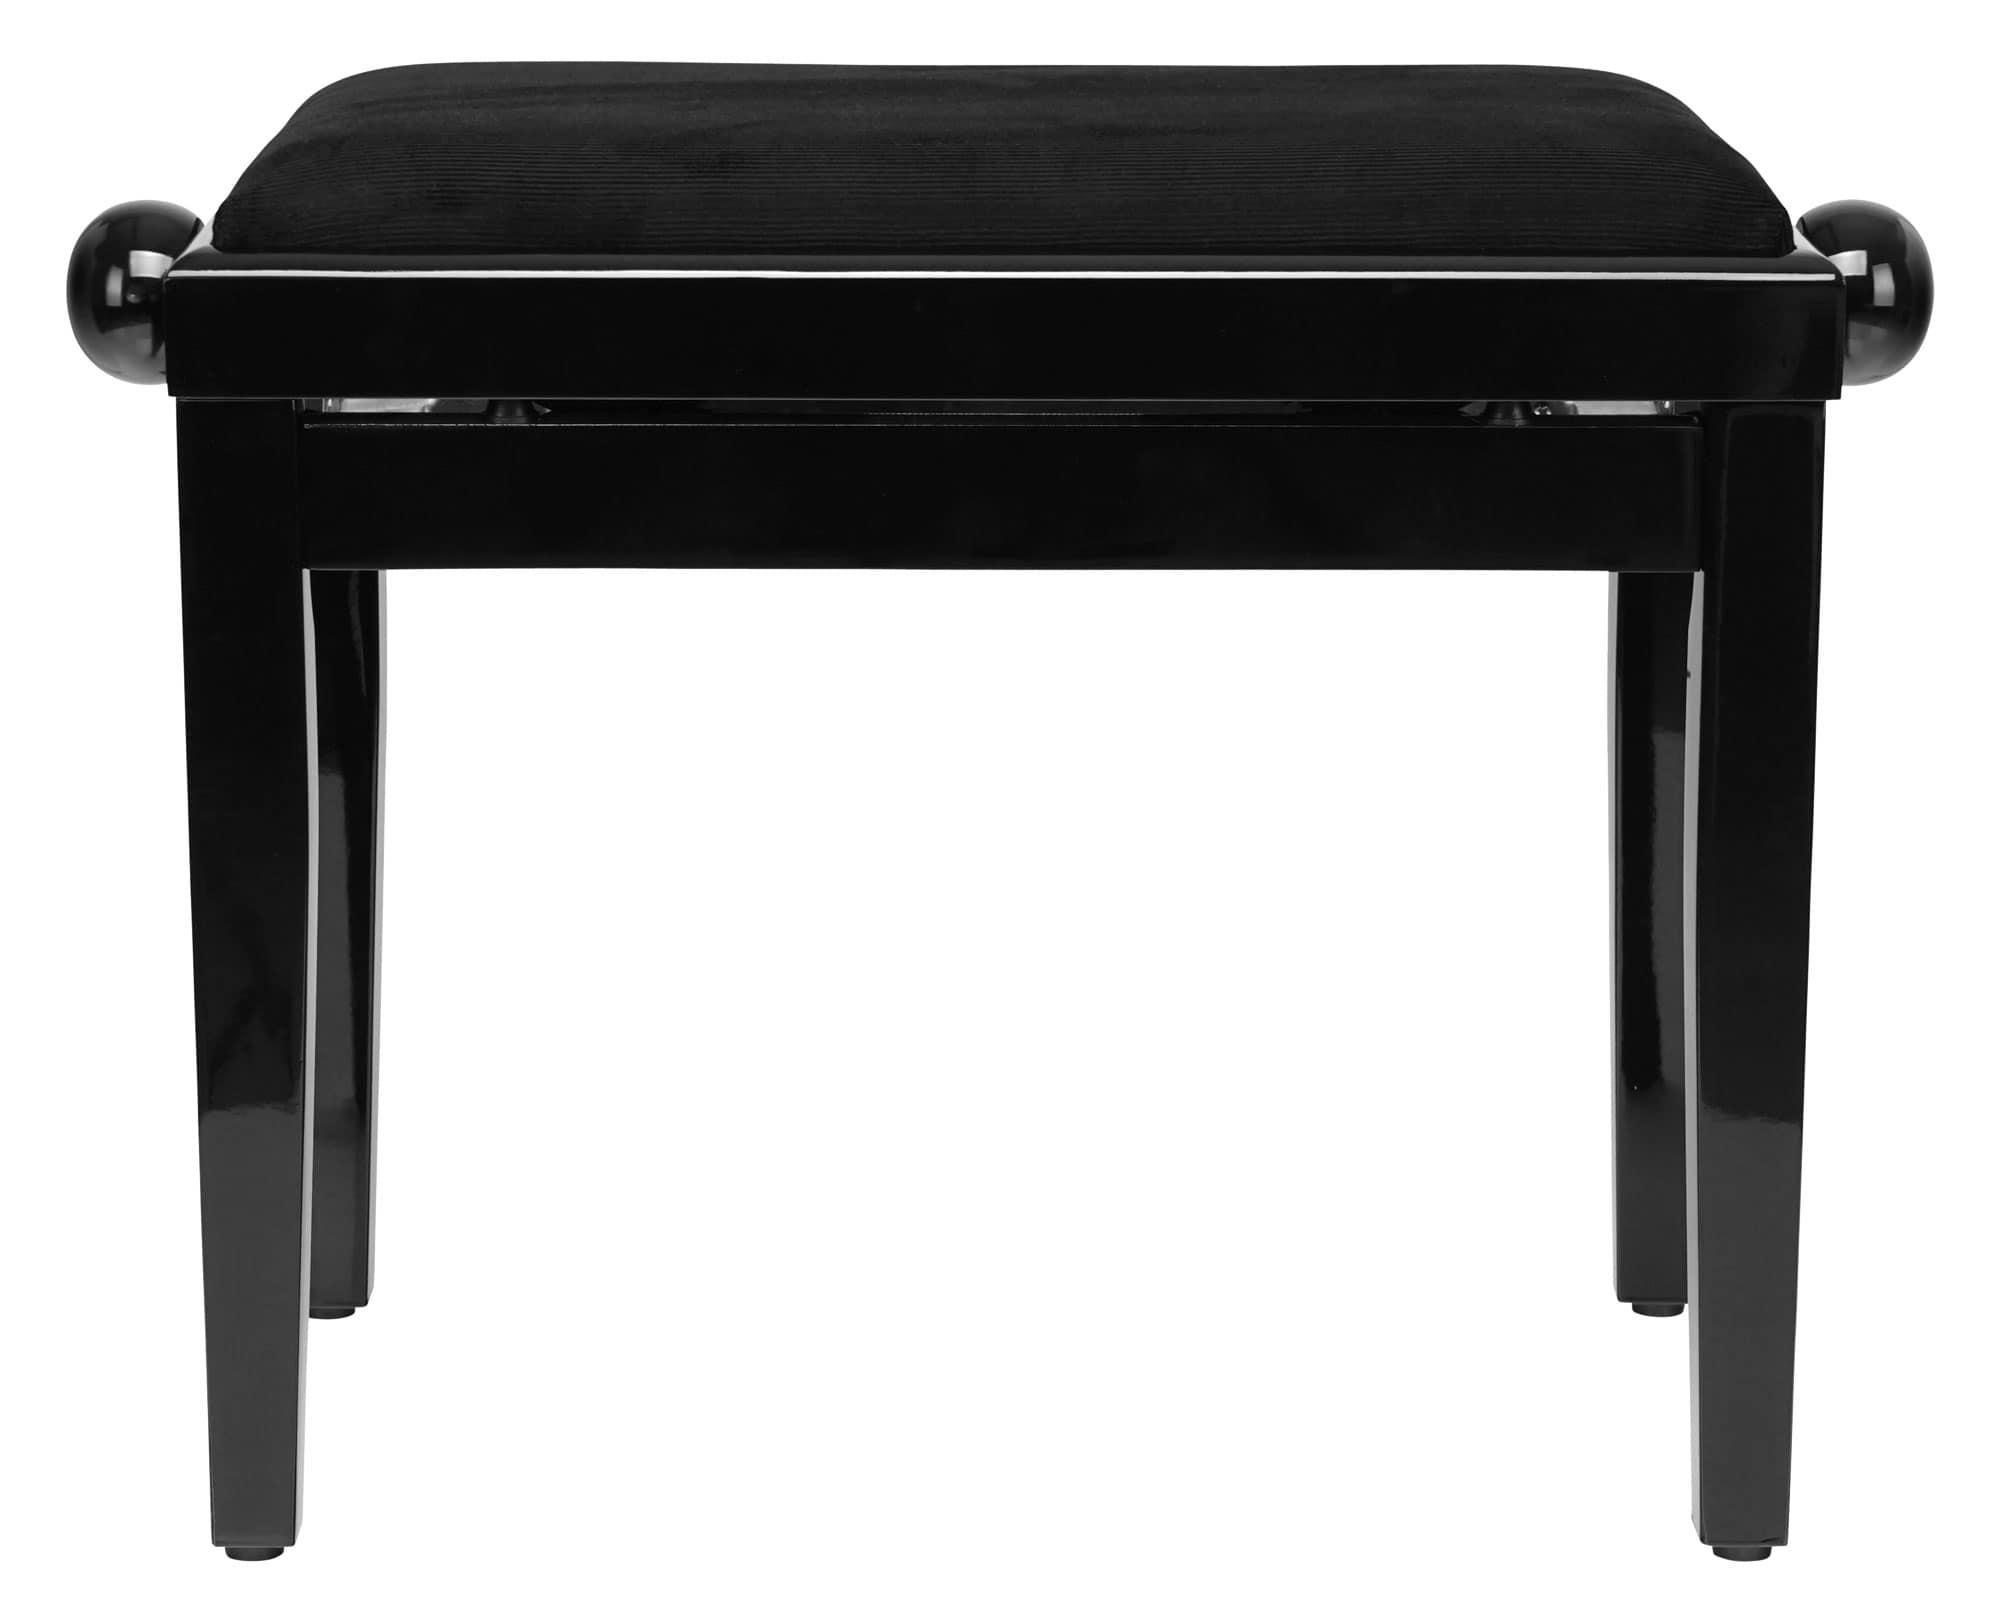 piano bank sitz klavier hocker klavier bank keyboard stuhl sitz schminkhocker ebay. Black Bedroom Furniture Sets. Home Design Ideas